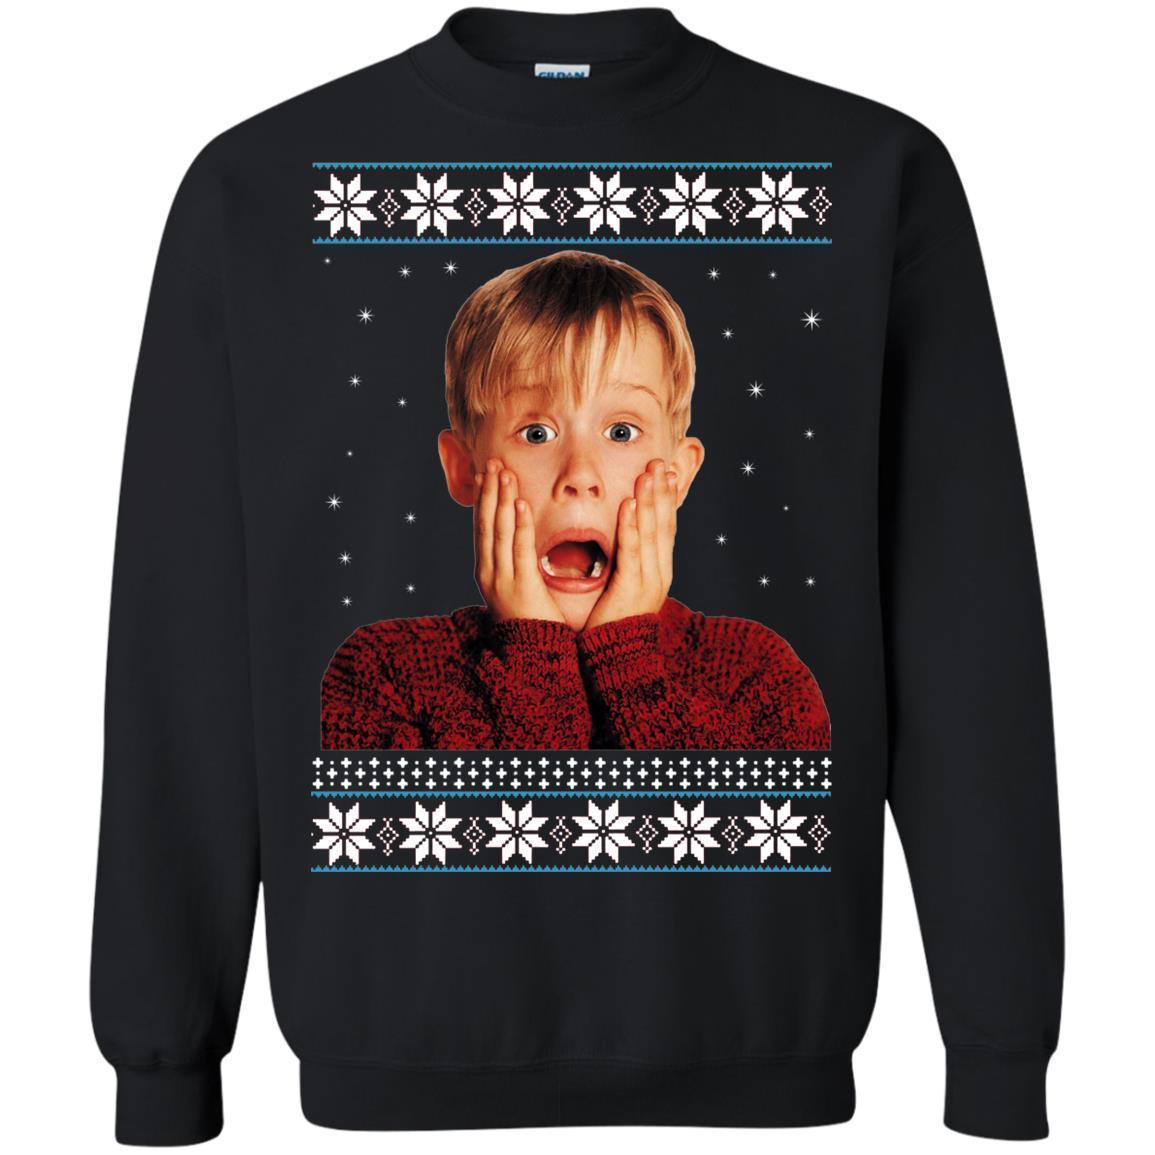 Kevin Mccallister Christmas Shirts